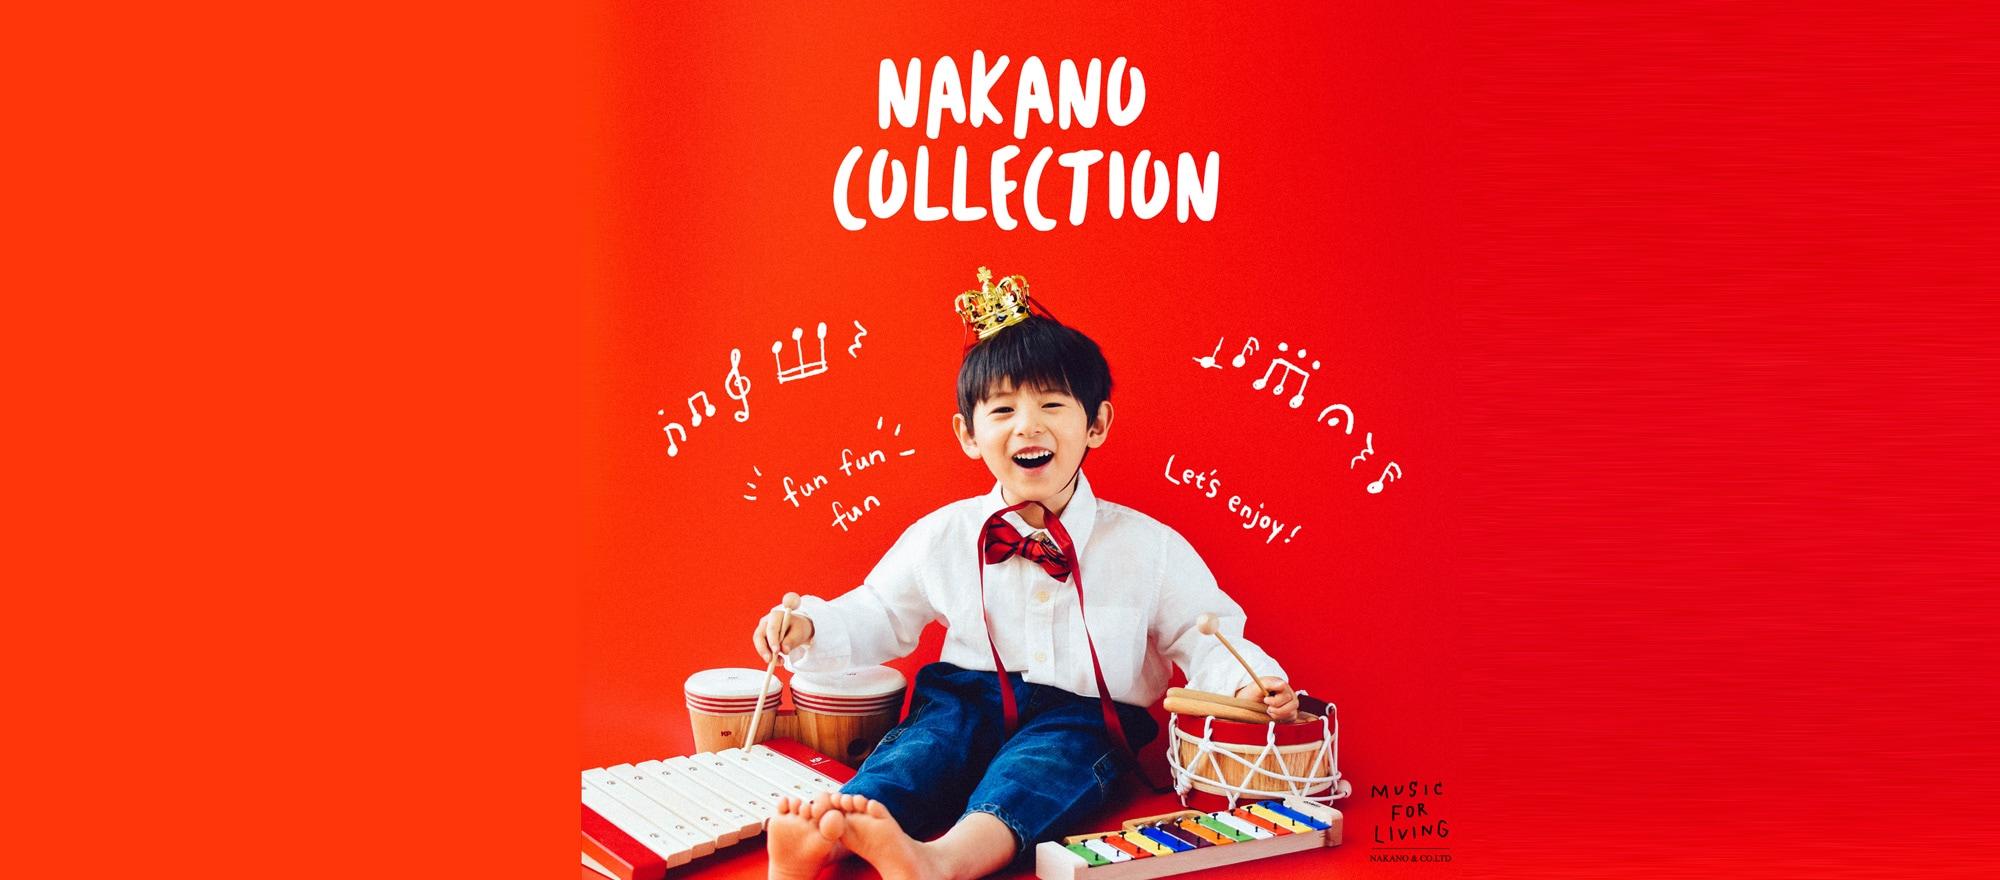 nakanocollection